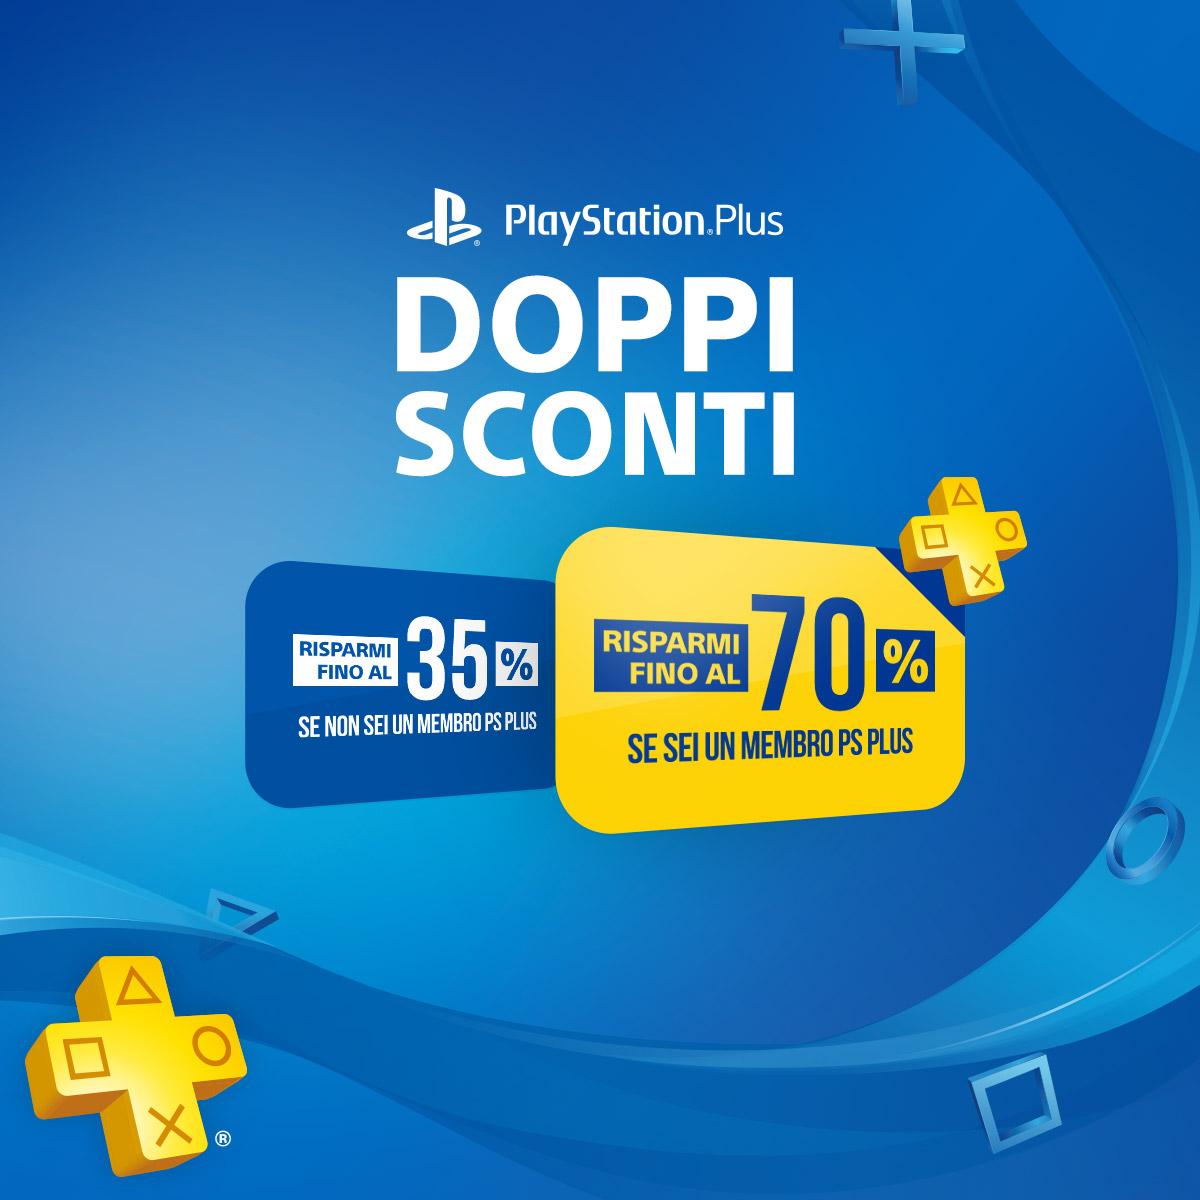 psplus-double-discounts-facebook-carousel-one-04-IT